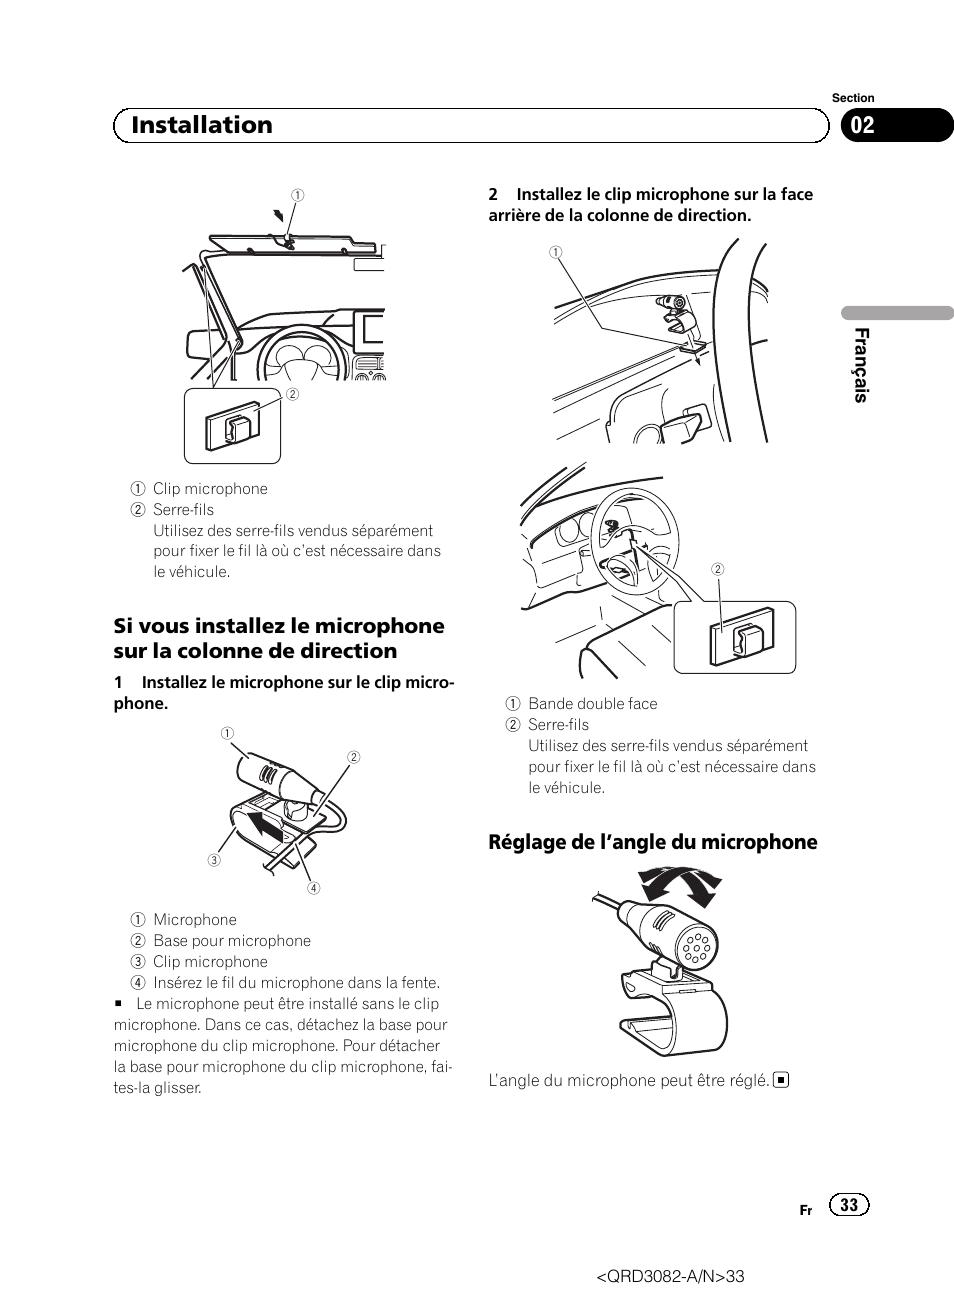 02 Installation R Glage De L 'angle Du Microphone Pioneer Avh. 02 Installation R Glage De L 'angle Du Microphone Pioneer Avh P4300dvd User Manual. Wiring. Pioneer Avh 4300 Wiring Diagram At Scoala.co